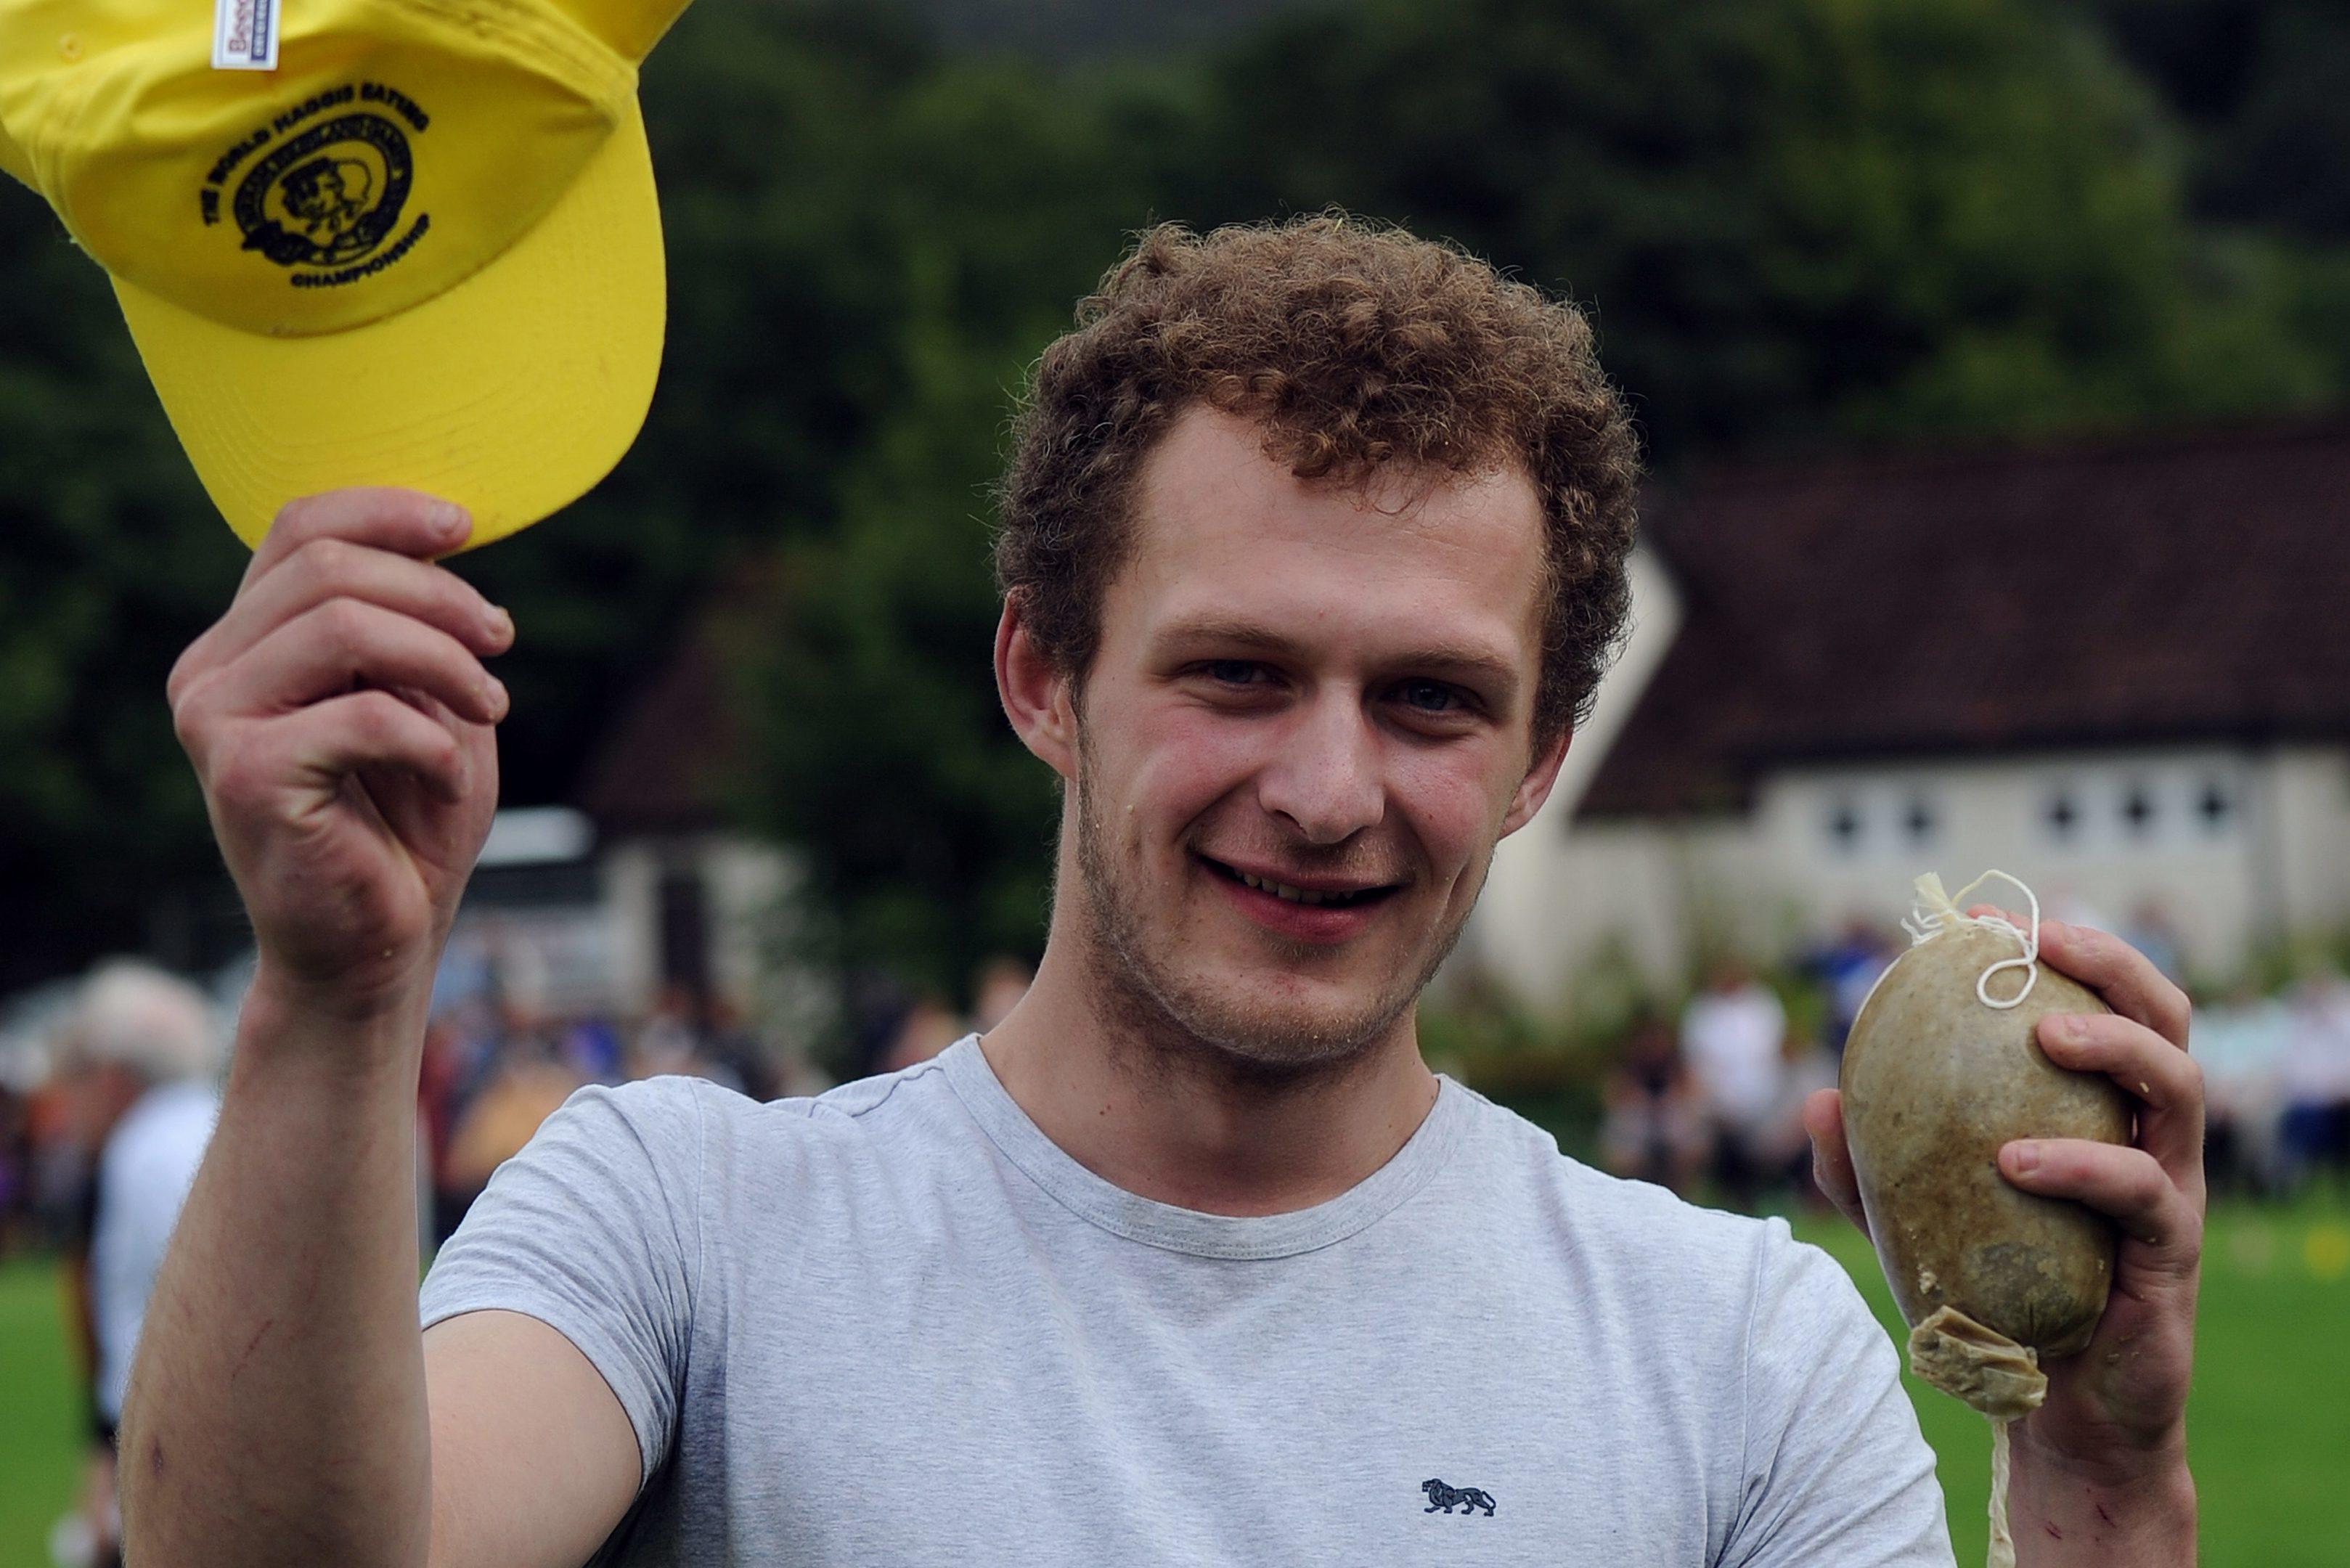 Winner of the Haggis Eating Championship, Alastair Ross, Birnam.